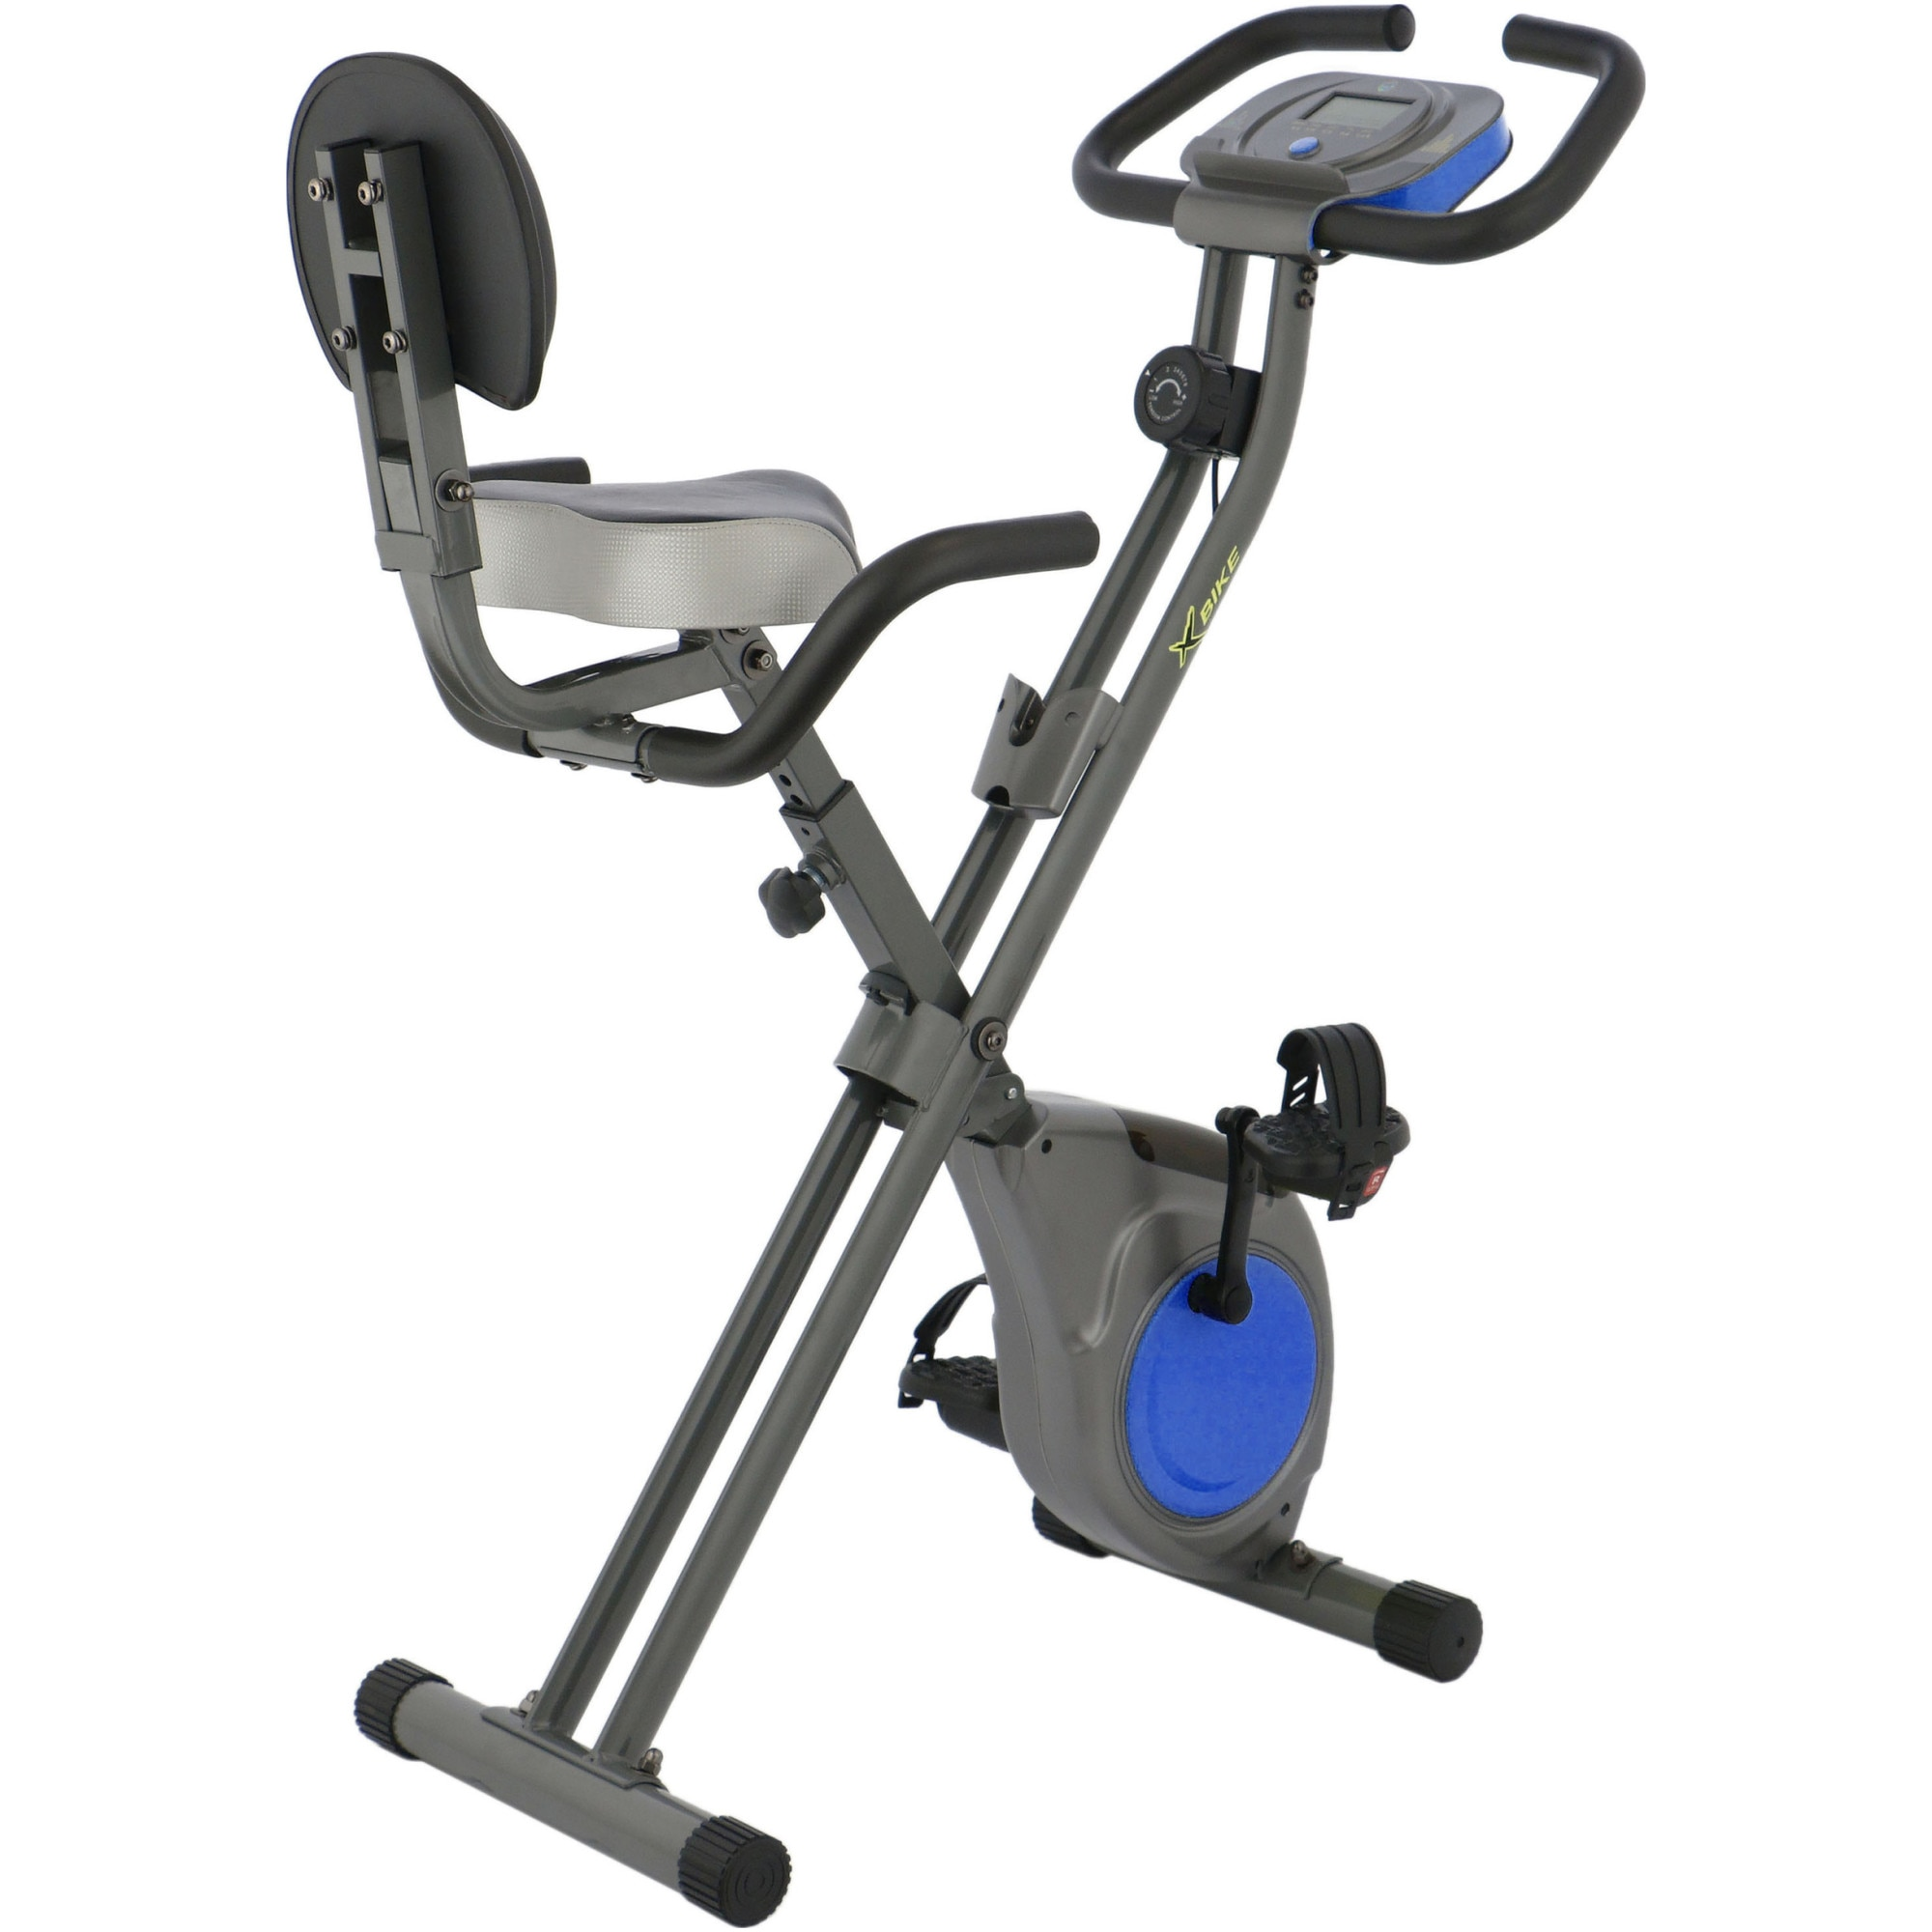 Fotografie Bicicleta fitness pliabila X-Bike BC-203, culoare gri-albastru